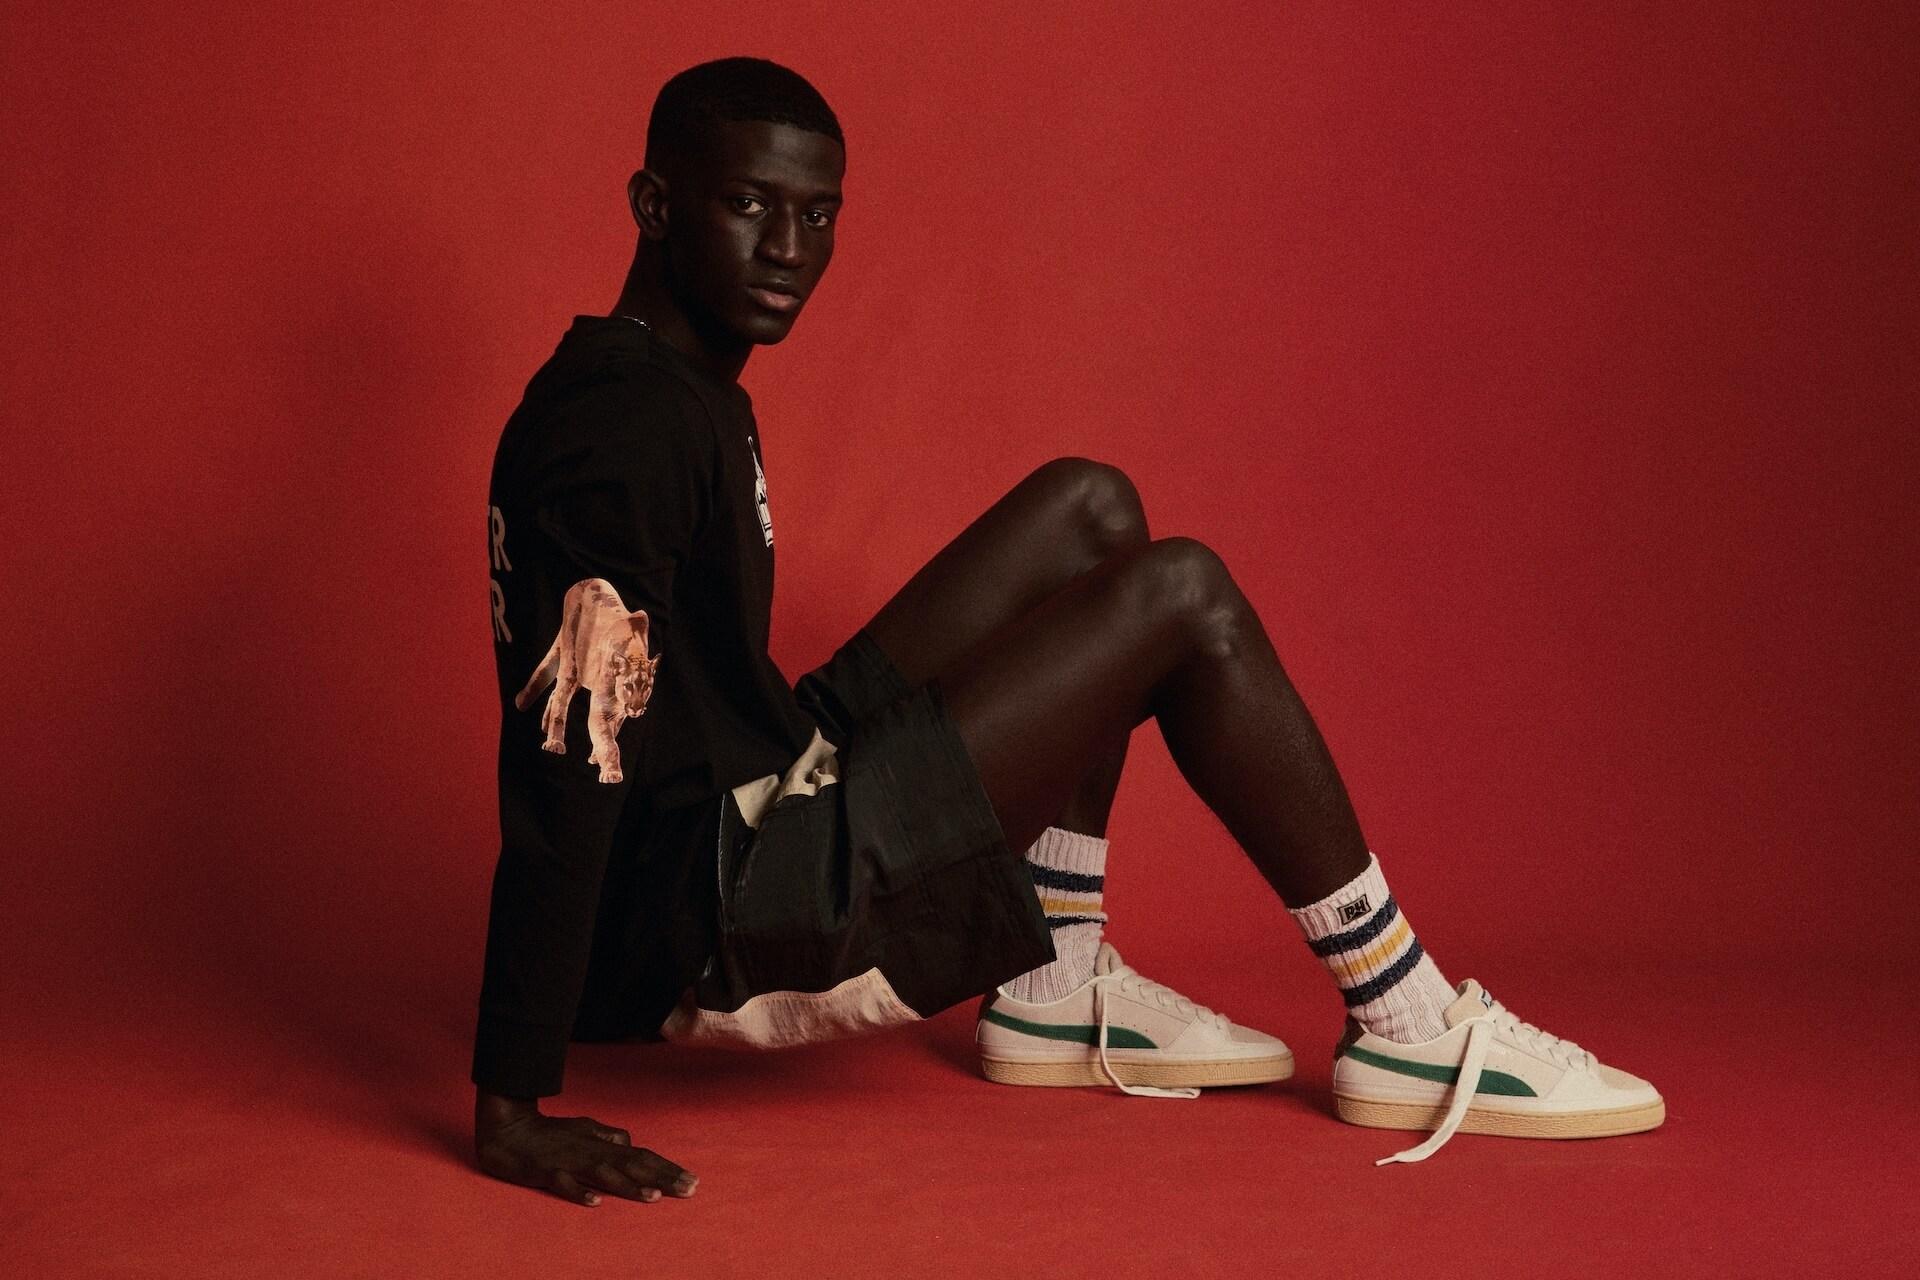 LA発ストリートブランドRHUDEとPUMAによるコラボレーションアイテムが新登場!「PUMA SUEDE」の新モデルも本日発売 Fashion10617_PUMA8